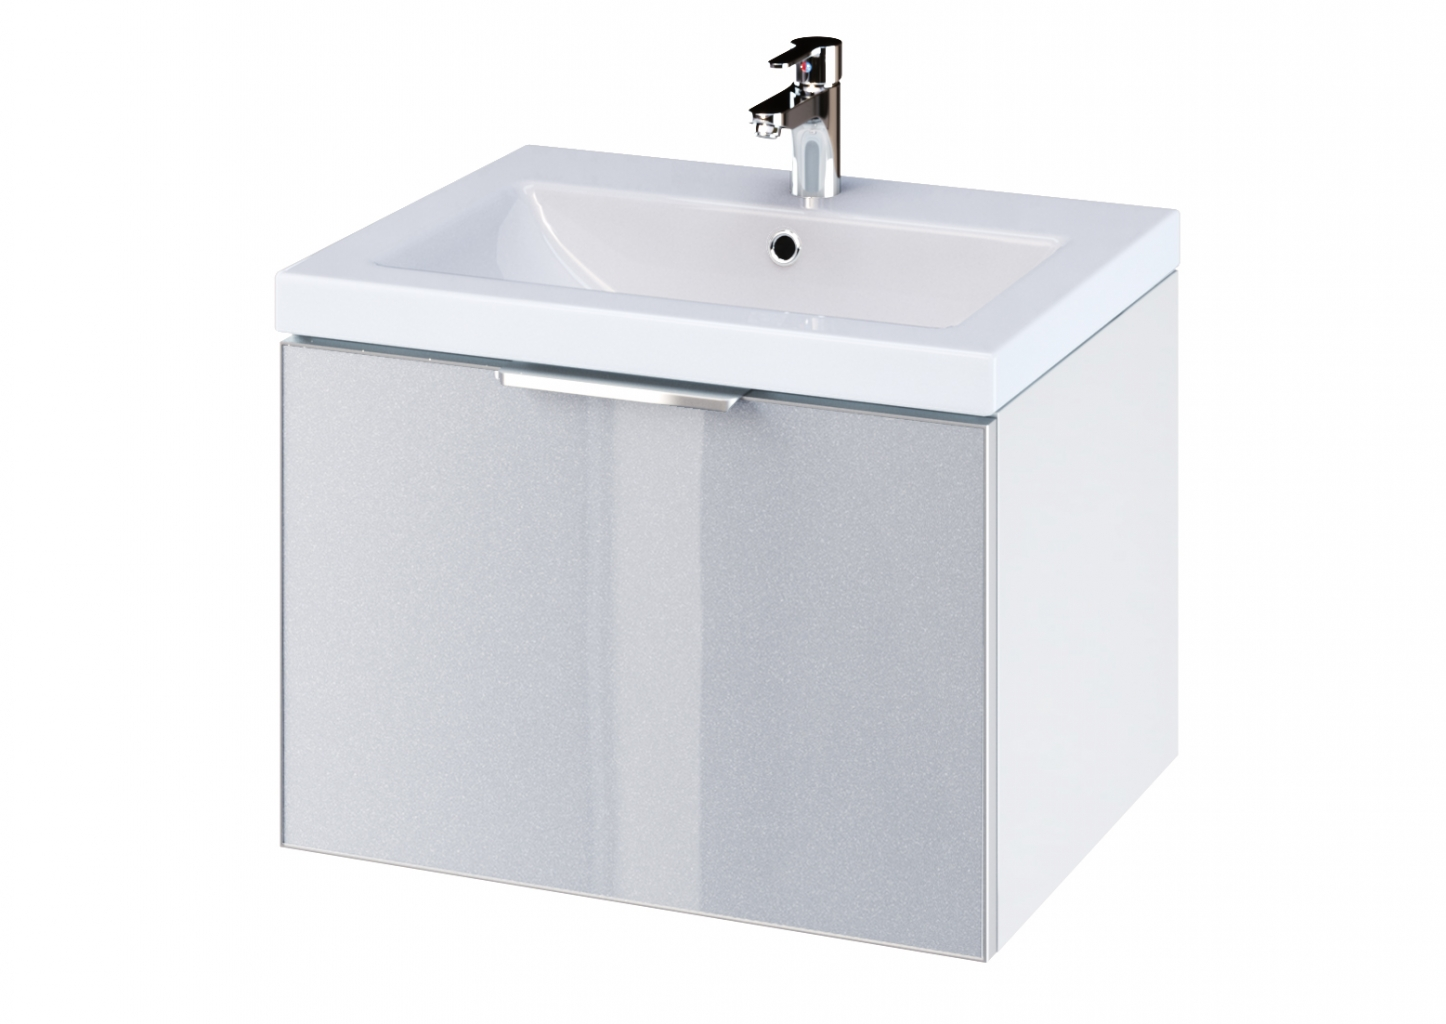 CERSANIT - Skříňka STILLO pod umyvadlo COMO/ ZURO/ AMAO/ COLOUR 60 bílá/ šedá dvířka (S575-003)